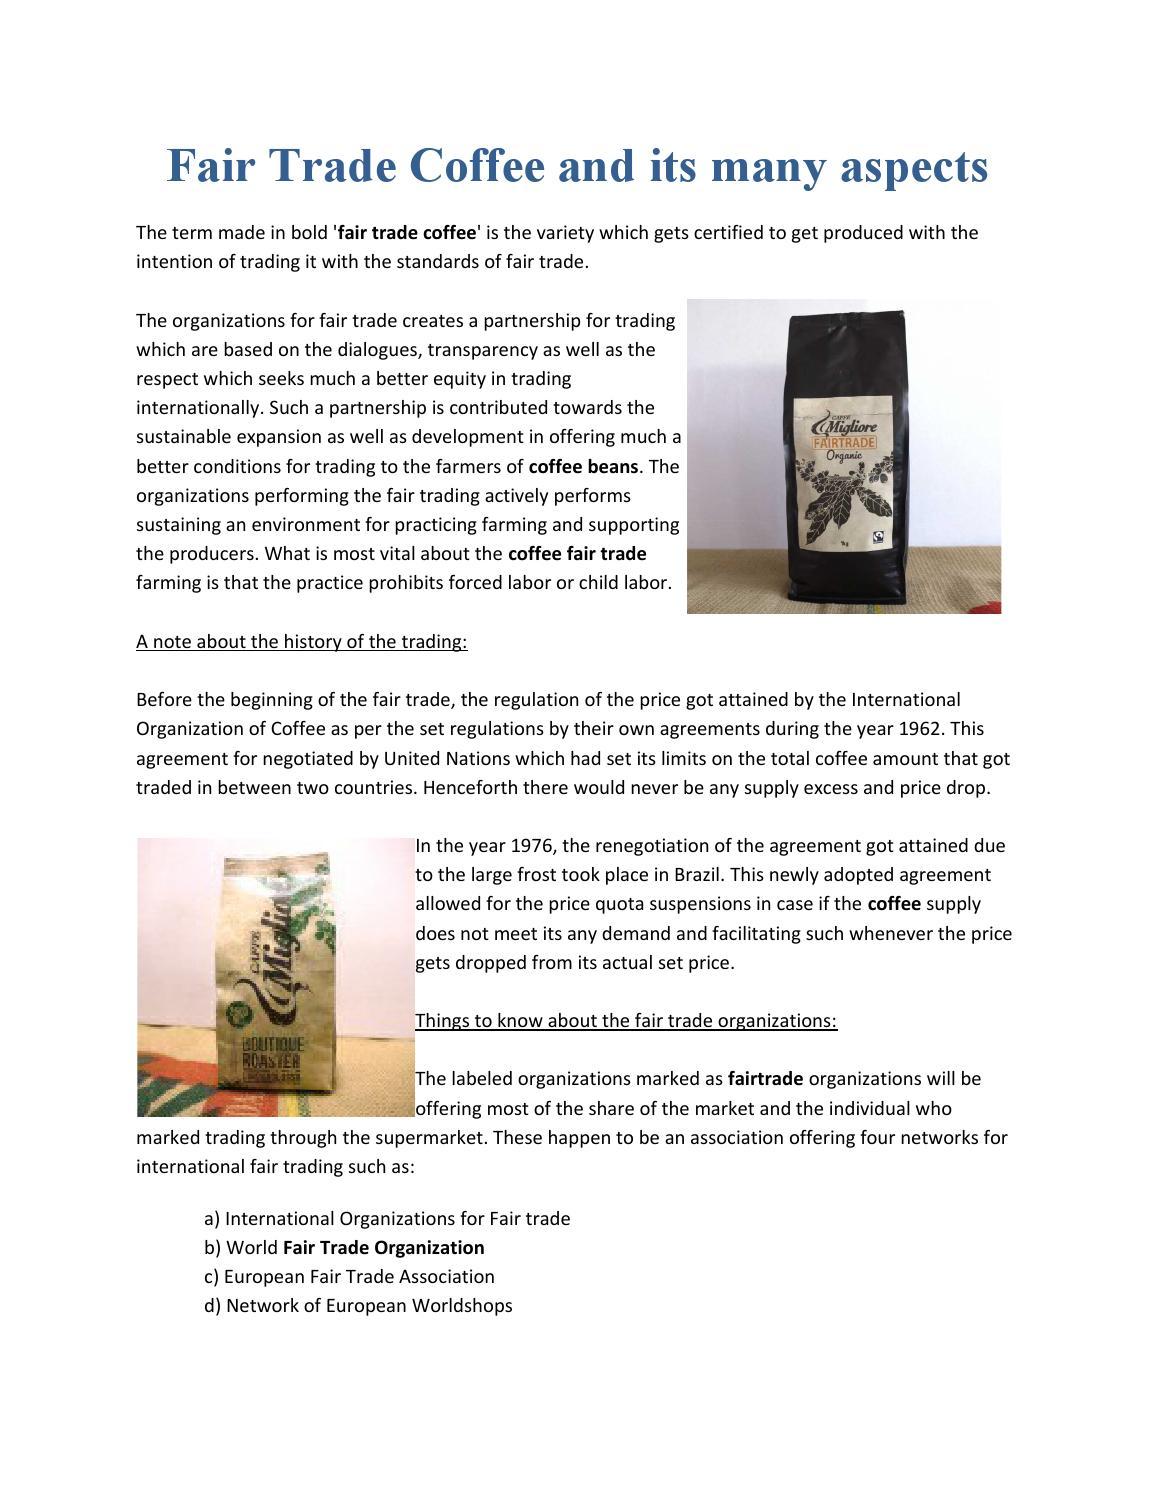 Fair Trade Coffee And Its Many Aspects By Tony Nicotra Issuu